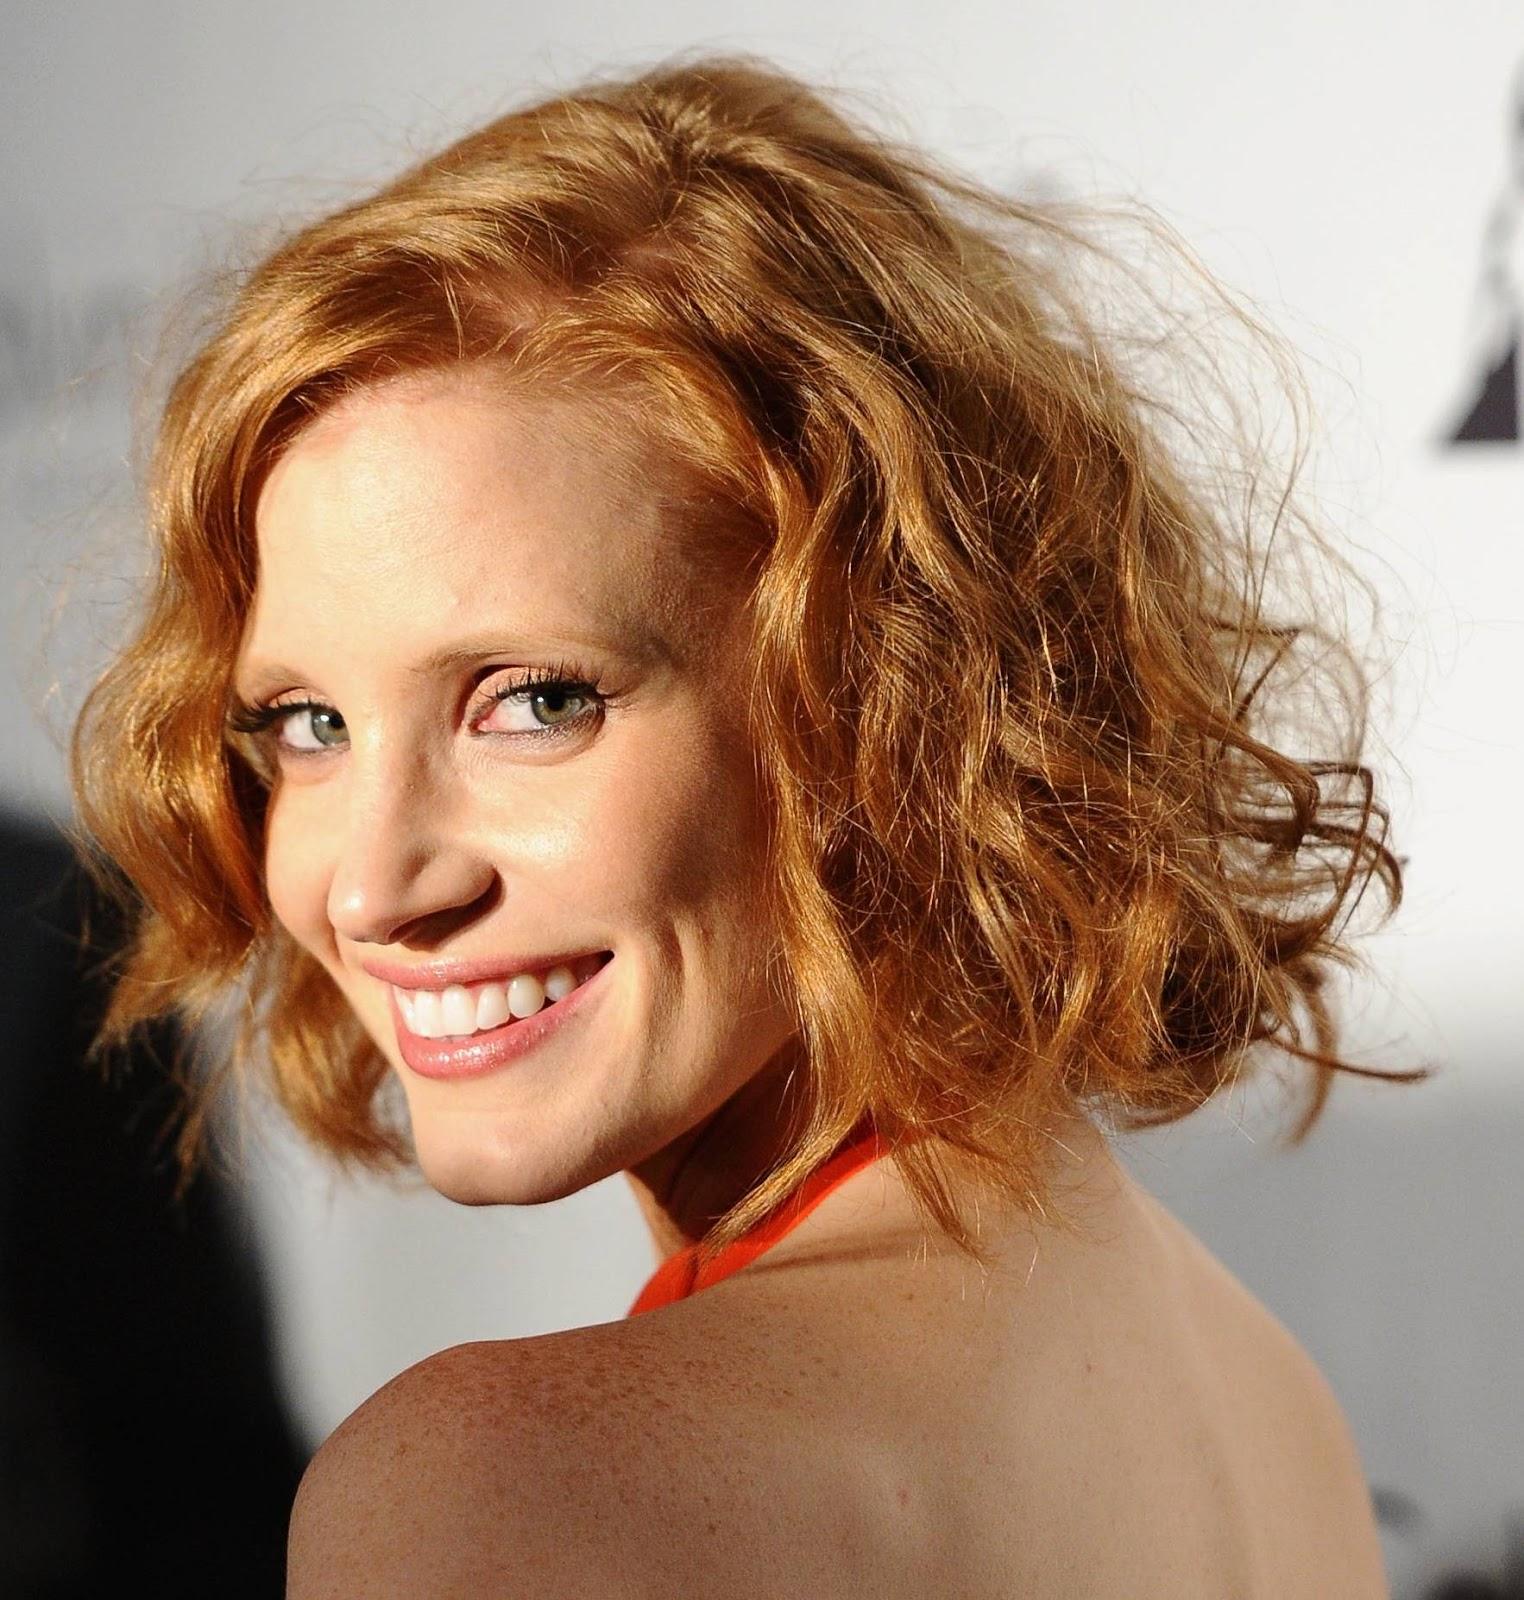 http://1.bp.blogspot.com/-r21C_CbpmPc/USoIix6AnTI/AAAAAAAAz0M/hQ3aqZ5Mqx4/s1600/jessica-chastain-short-curly-hair.jpg